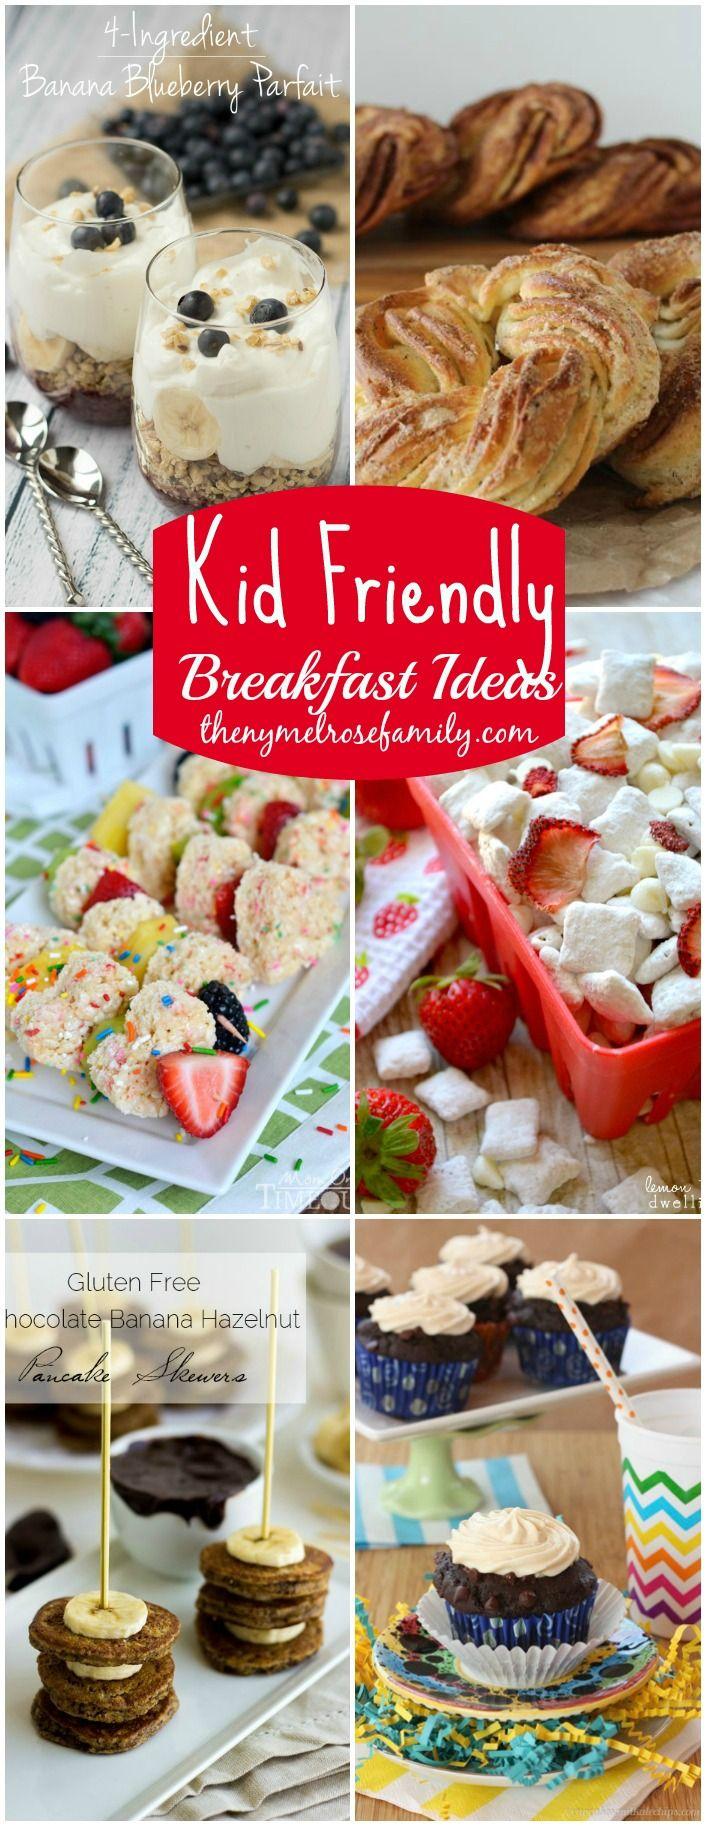 Kid Friendly Breakfast Ideas www.thenymelrosefamily.com #kidfriendly #breakfastideas